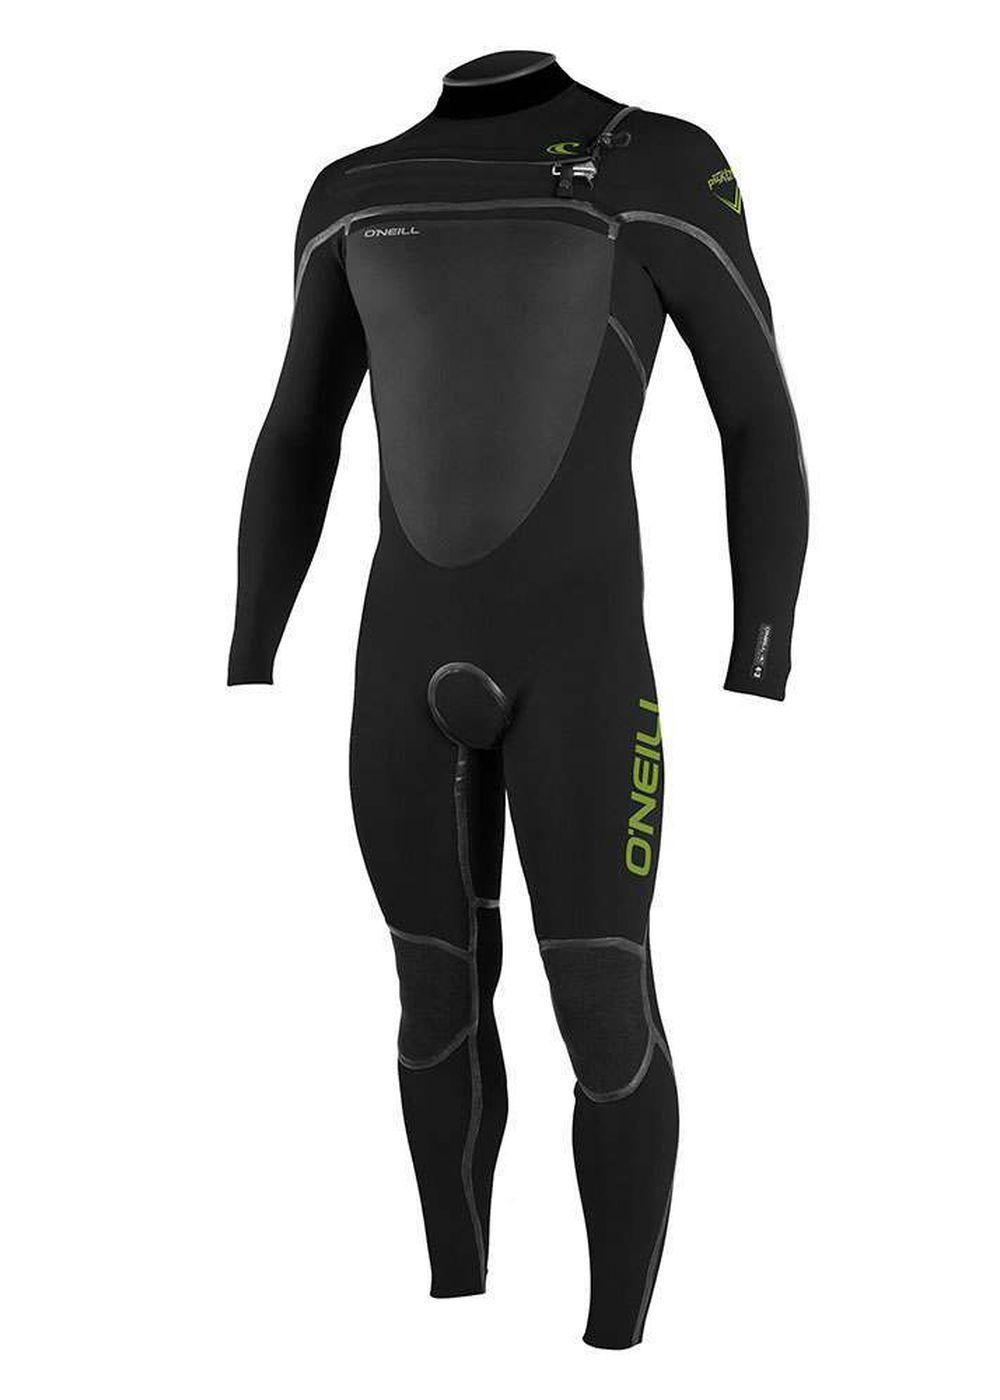 Oneill Psycho Tech Fz 5/4 Fsw Wetsuit 2017 Black Picture